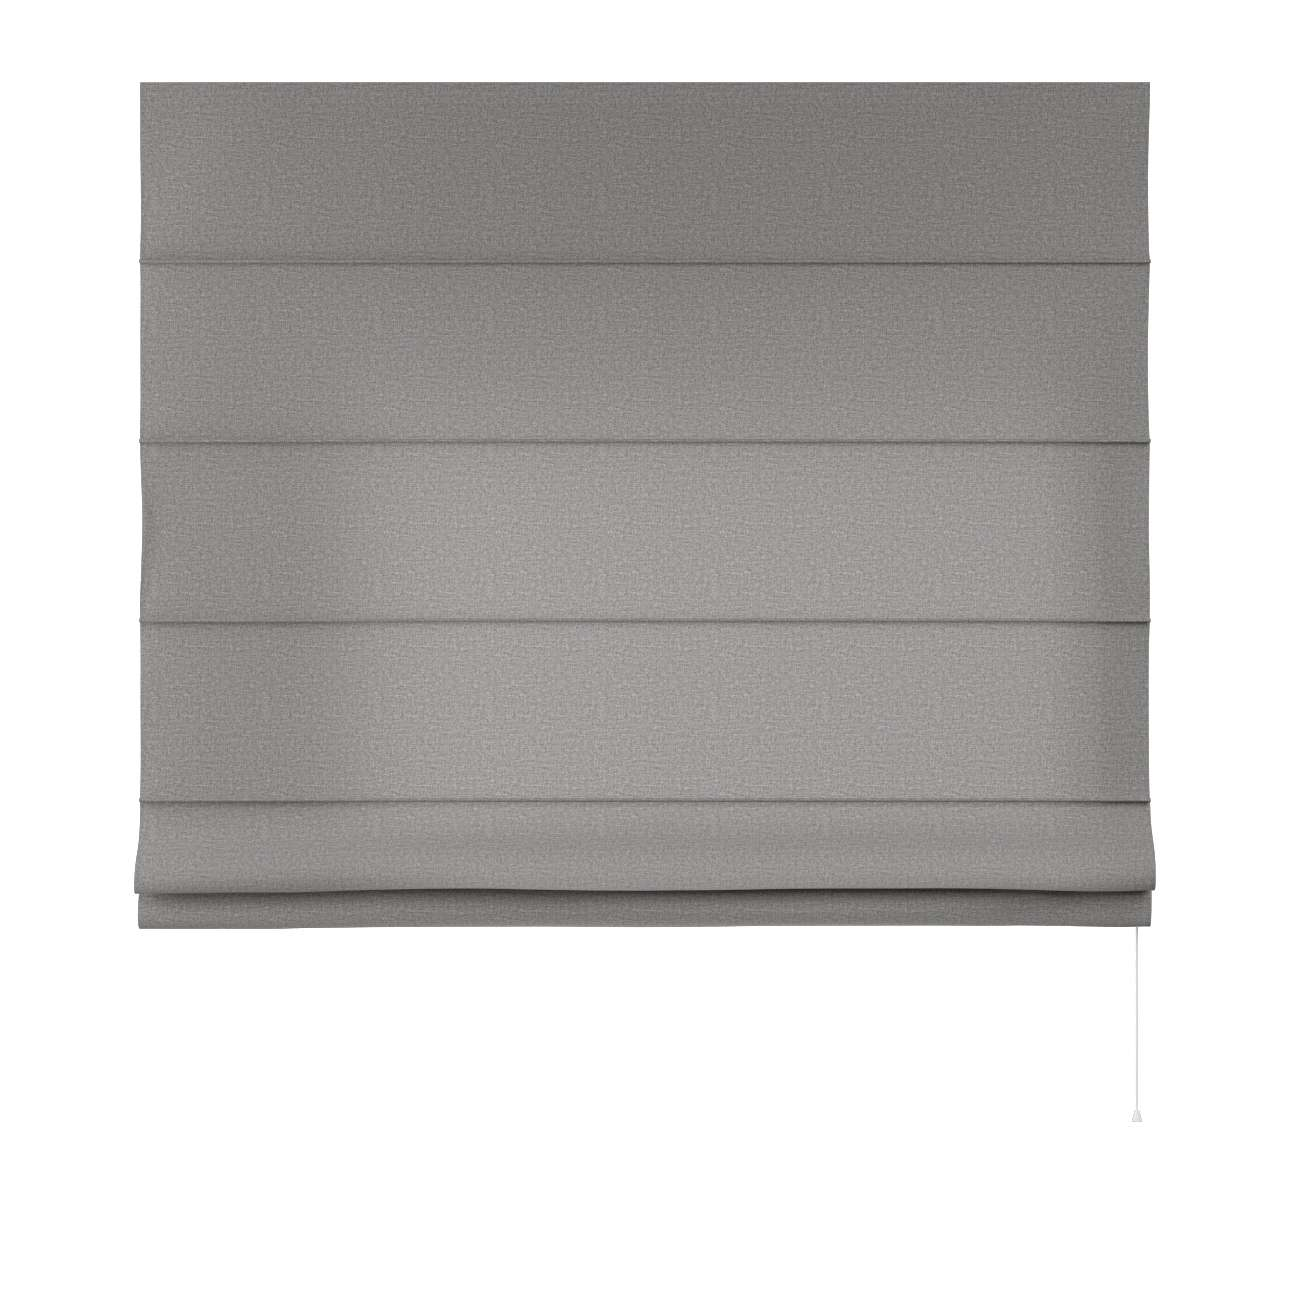 Foldegardin Capri<br/>Uden flæsekant 80 x 170 cm fra kollektionen Edinburgh, Stof: 115-81